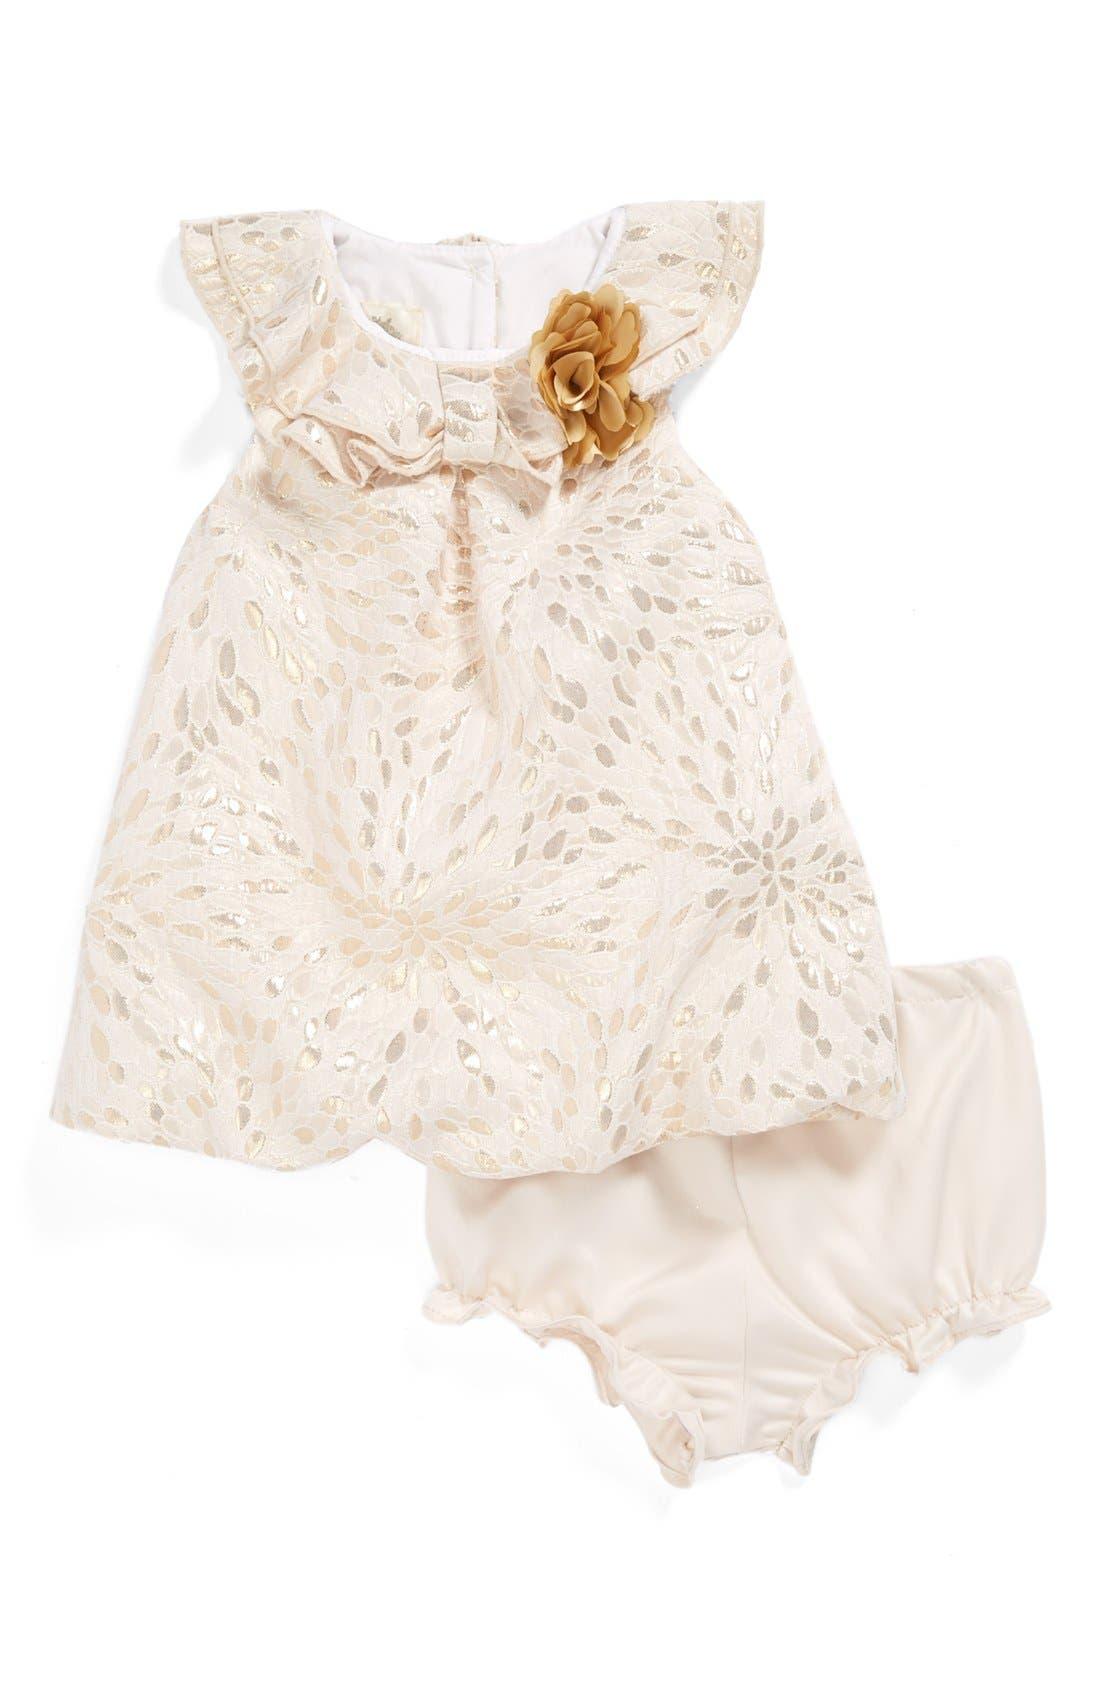 Alternate Image 1 Selected - Pippa & Julie Brocade Bubble Dress (Baby Girls)